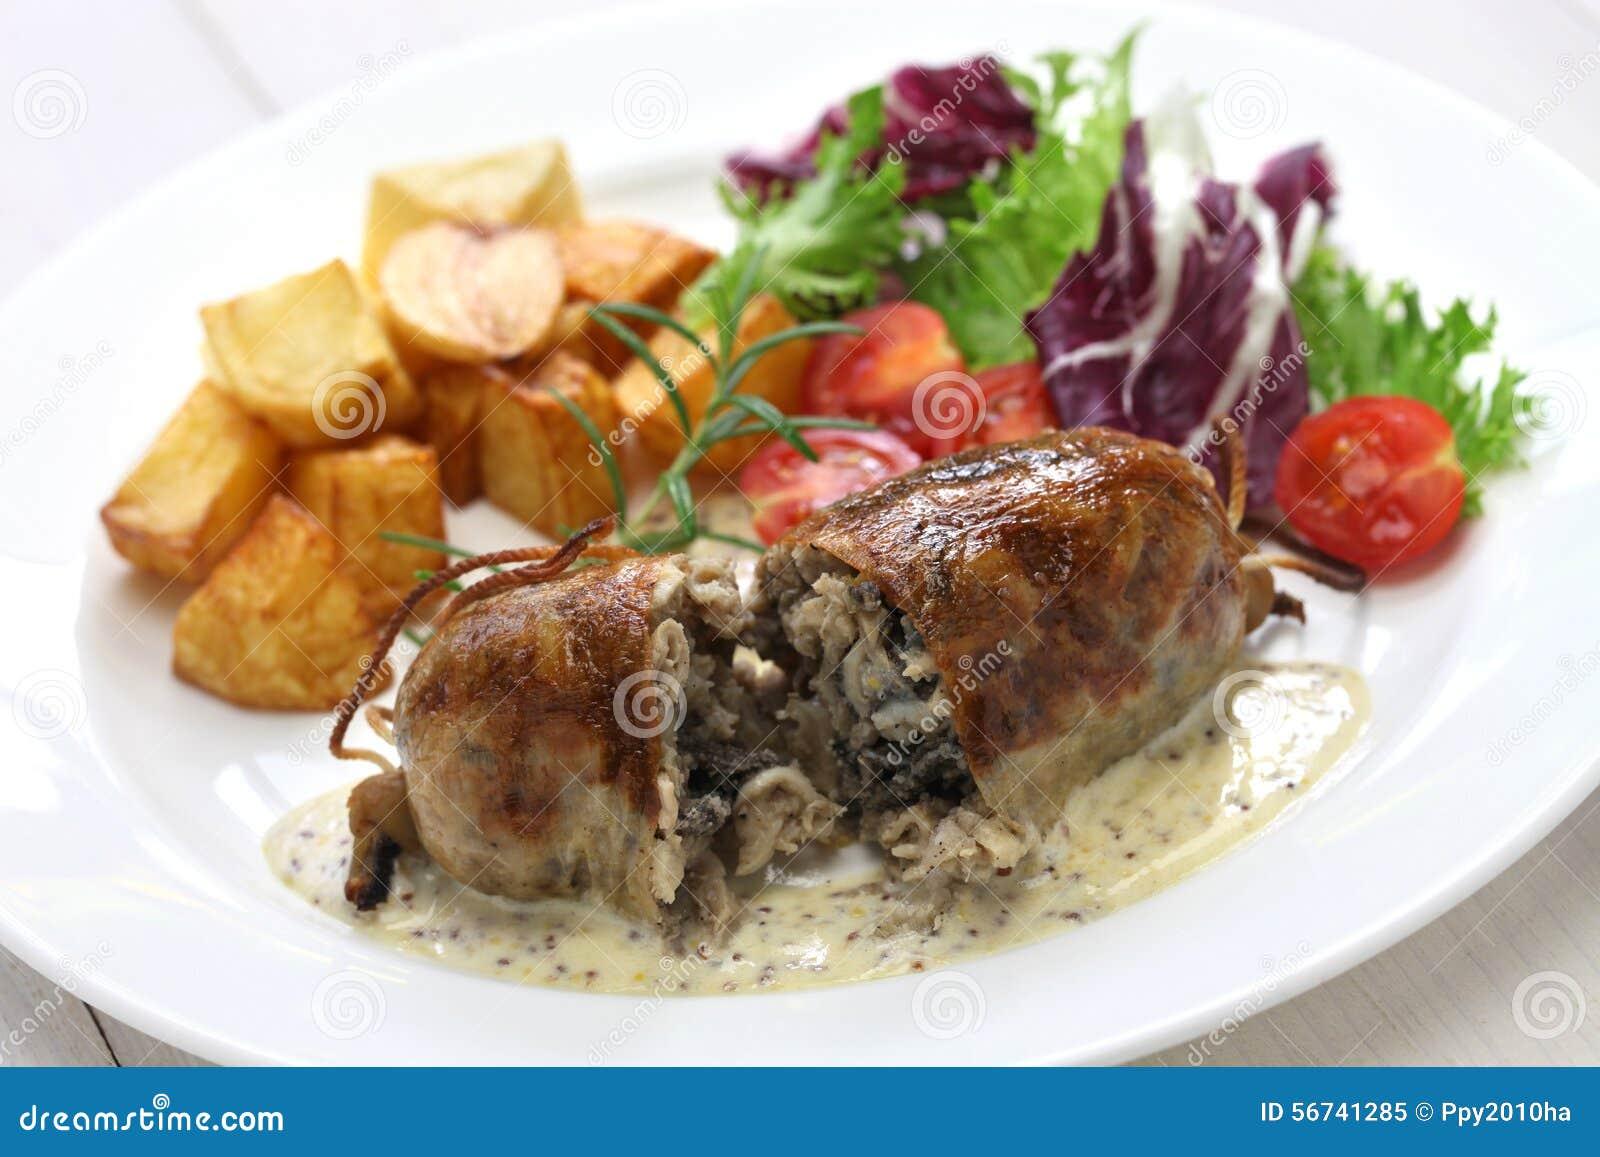 how to make sausage lyonnaise